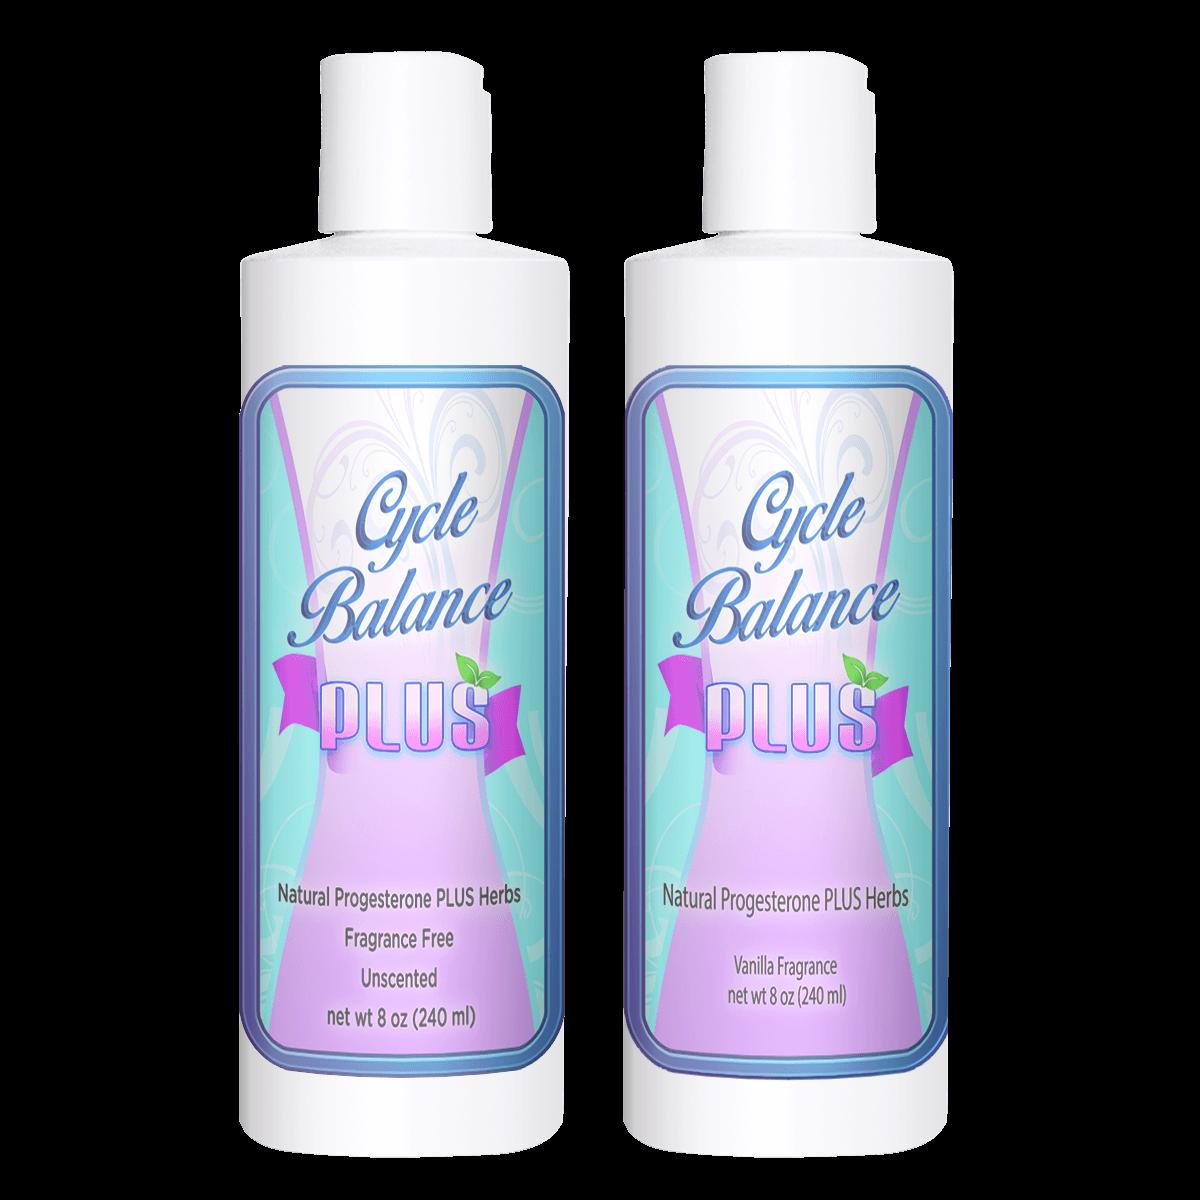 Cycle Balance Plus Helps Hormonal Imbalance and Menopausal Discomfort